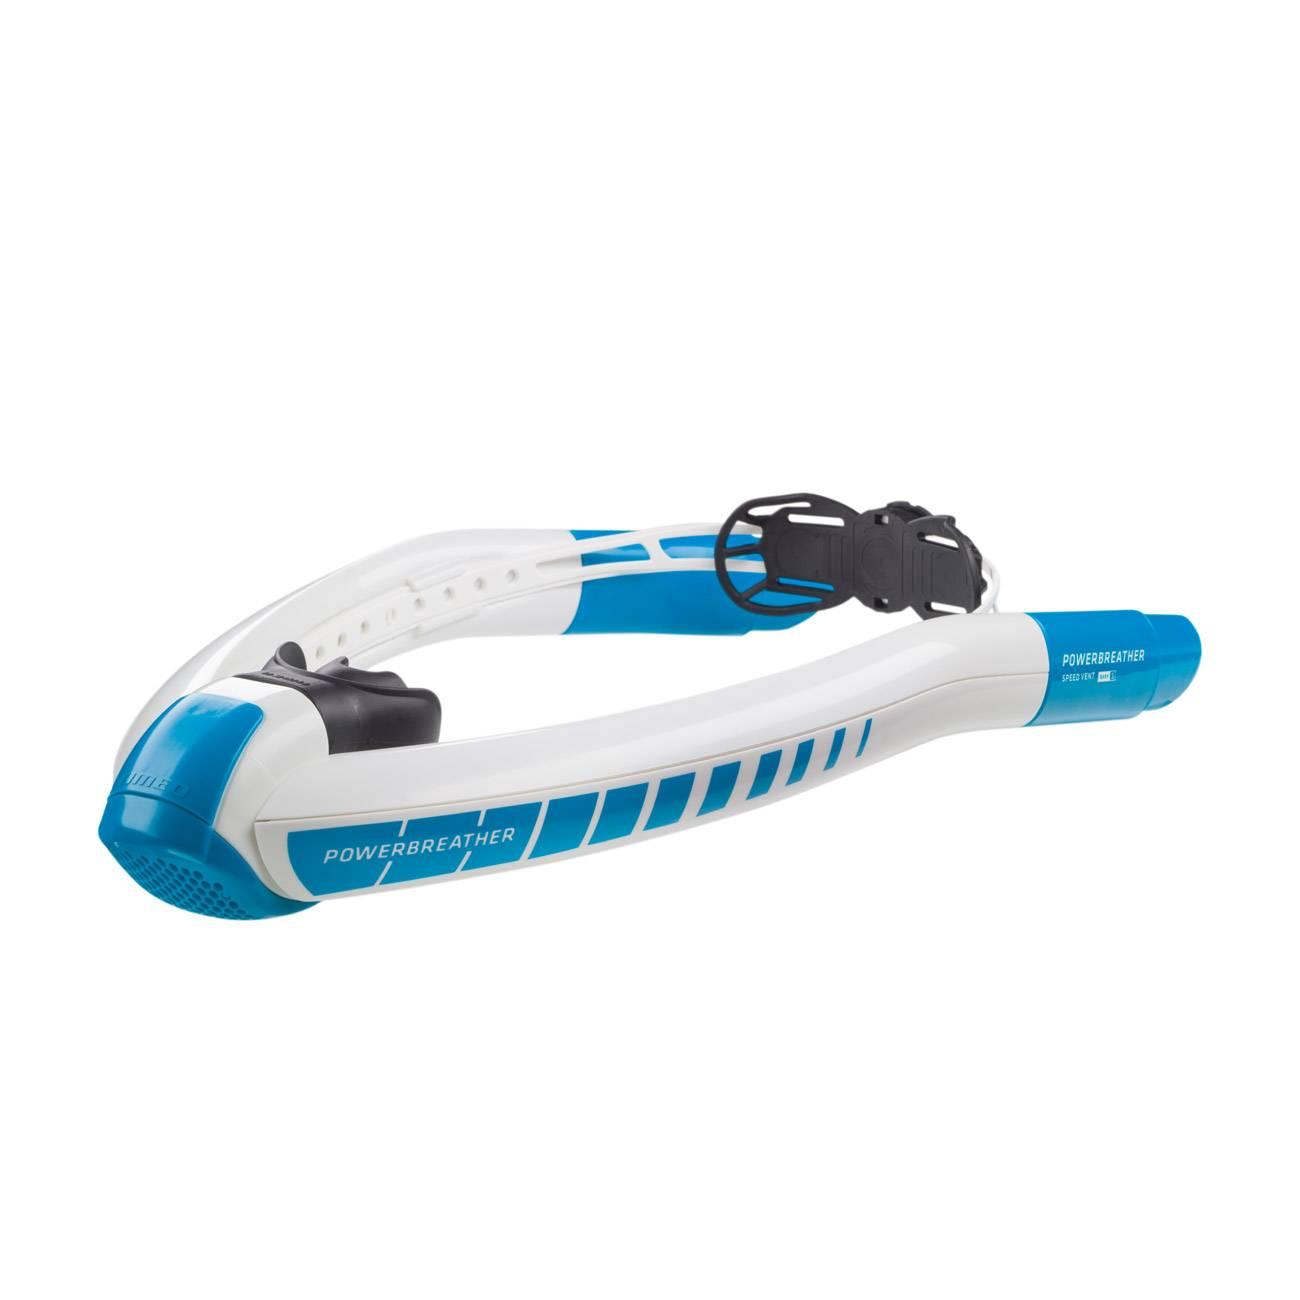 Powerbreather Sport Edition - Snorkel 2.0 imagine